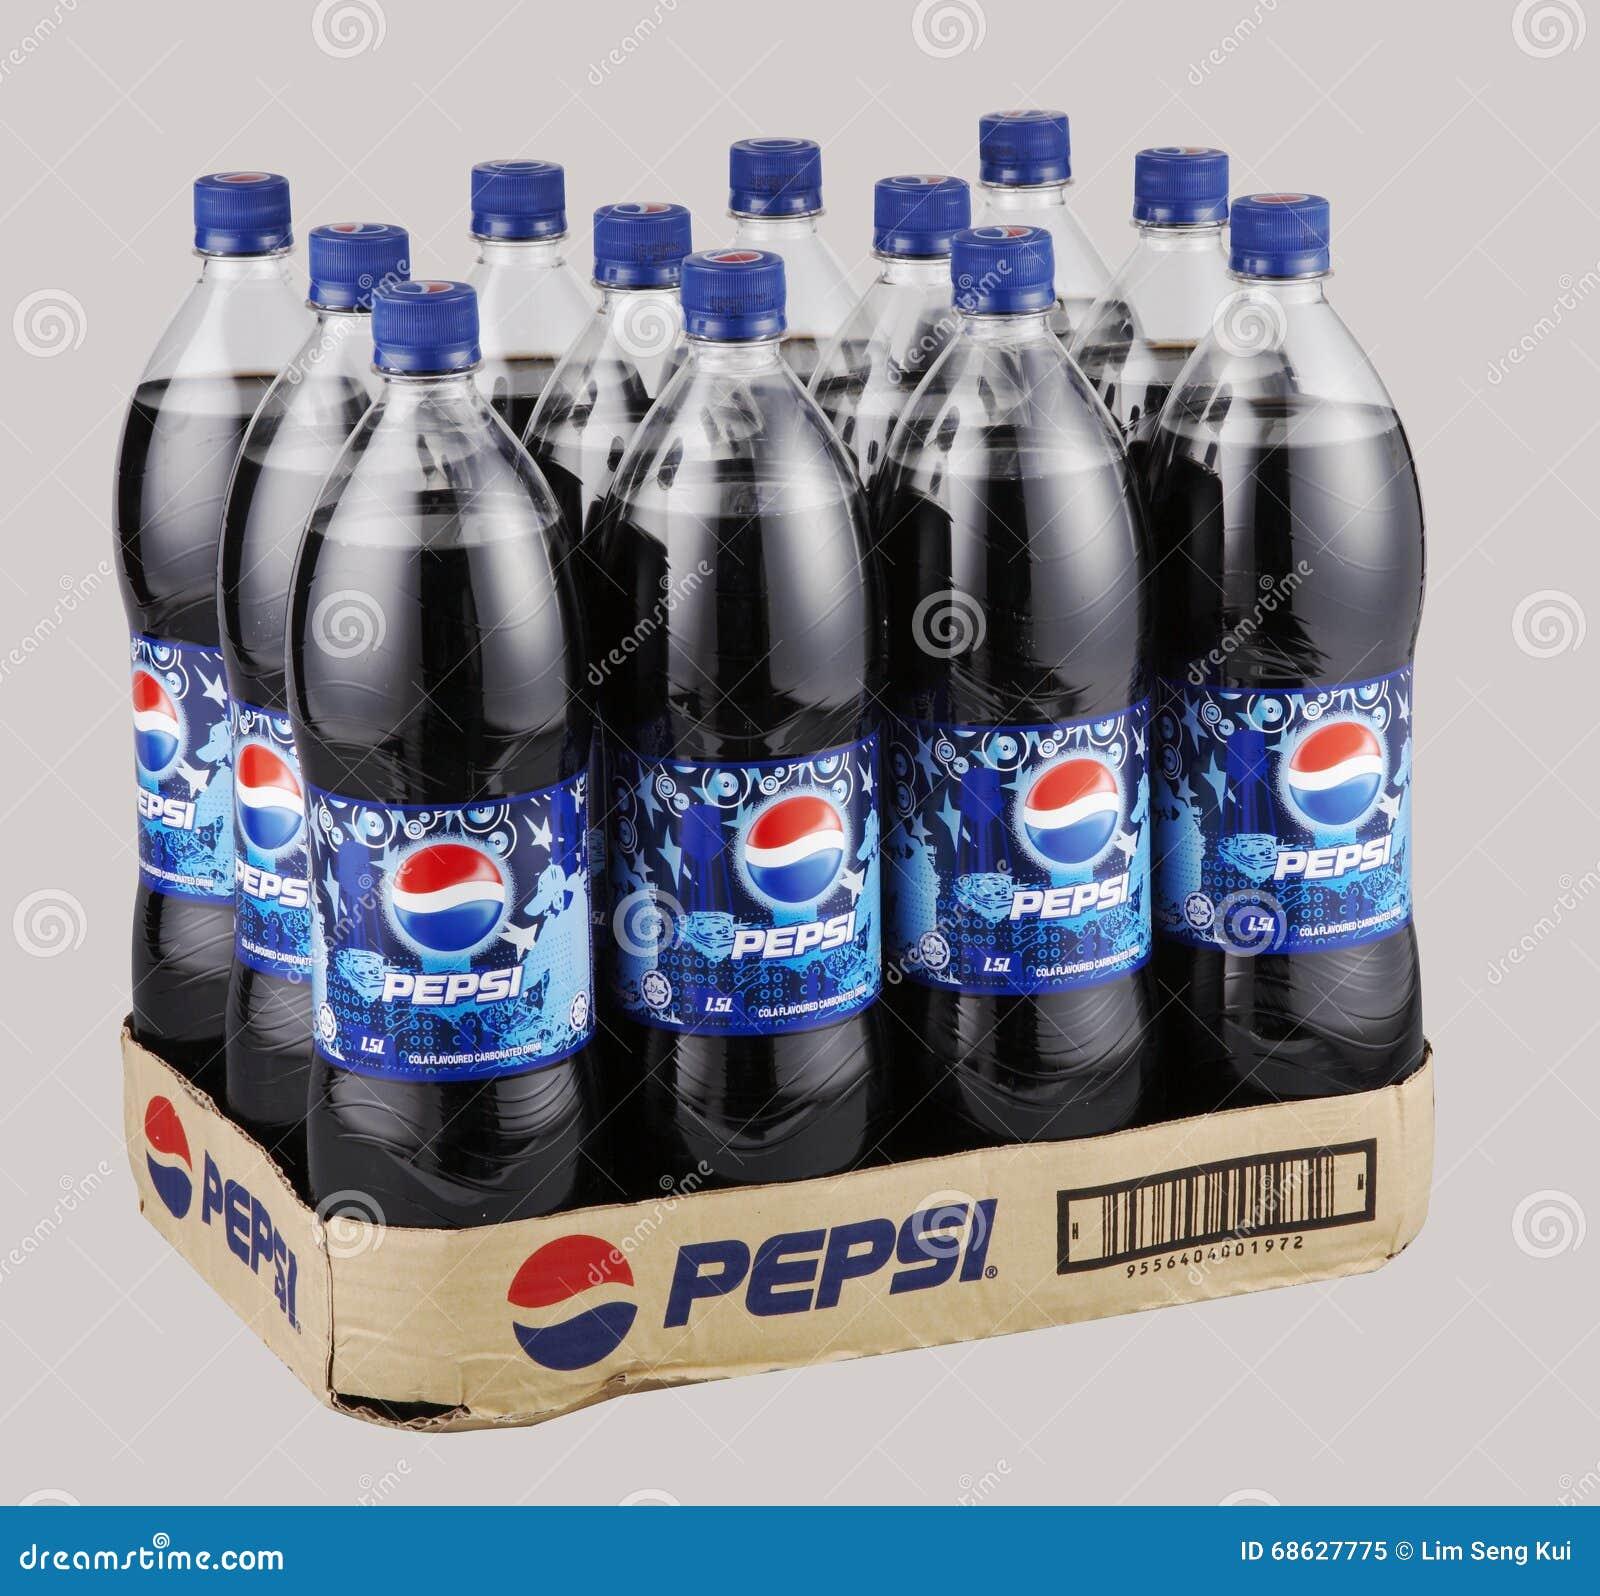 Pepsi 1 5l editorial image  Image of illustrative, bottle